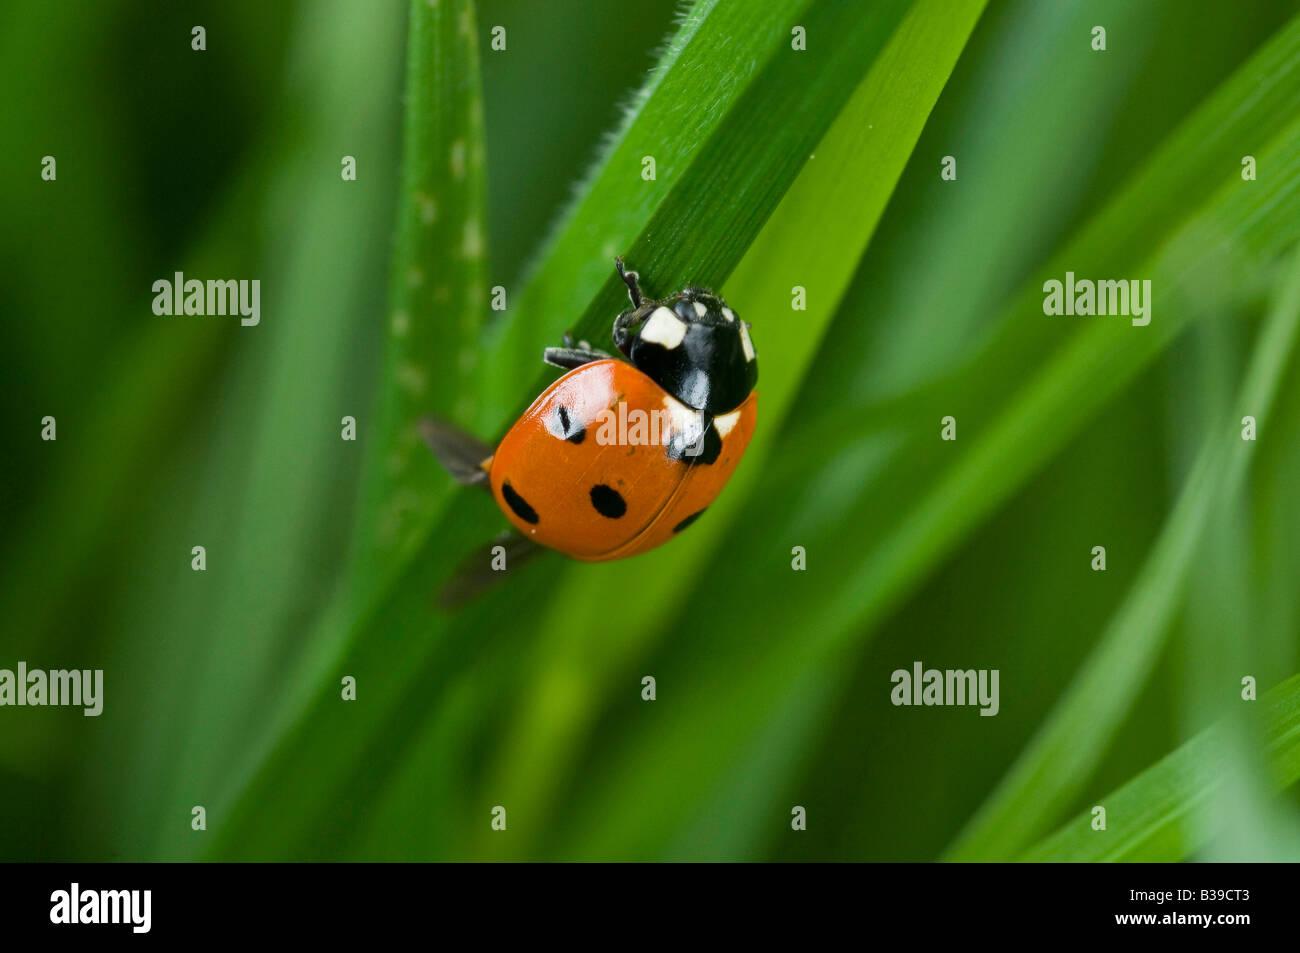 Ladybird Cocinella 7-punctata in long grass. Stock Photo